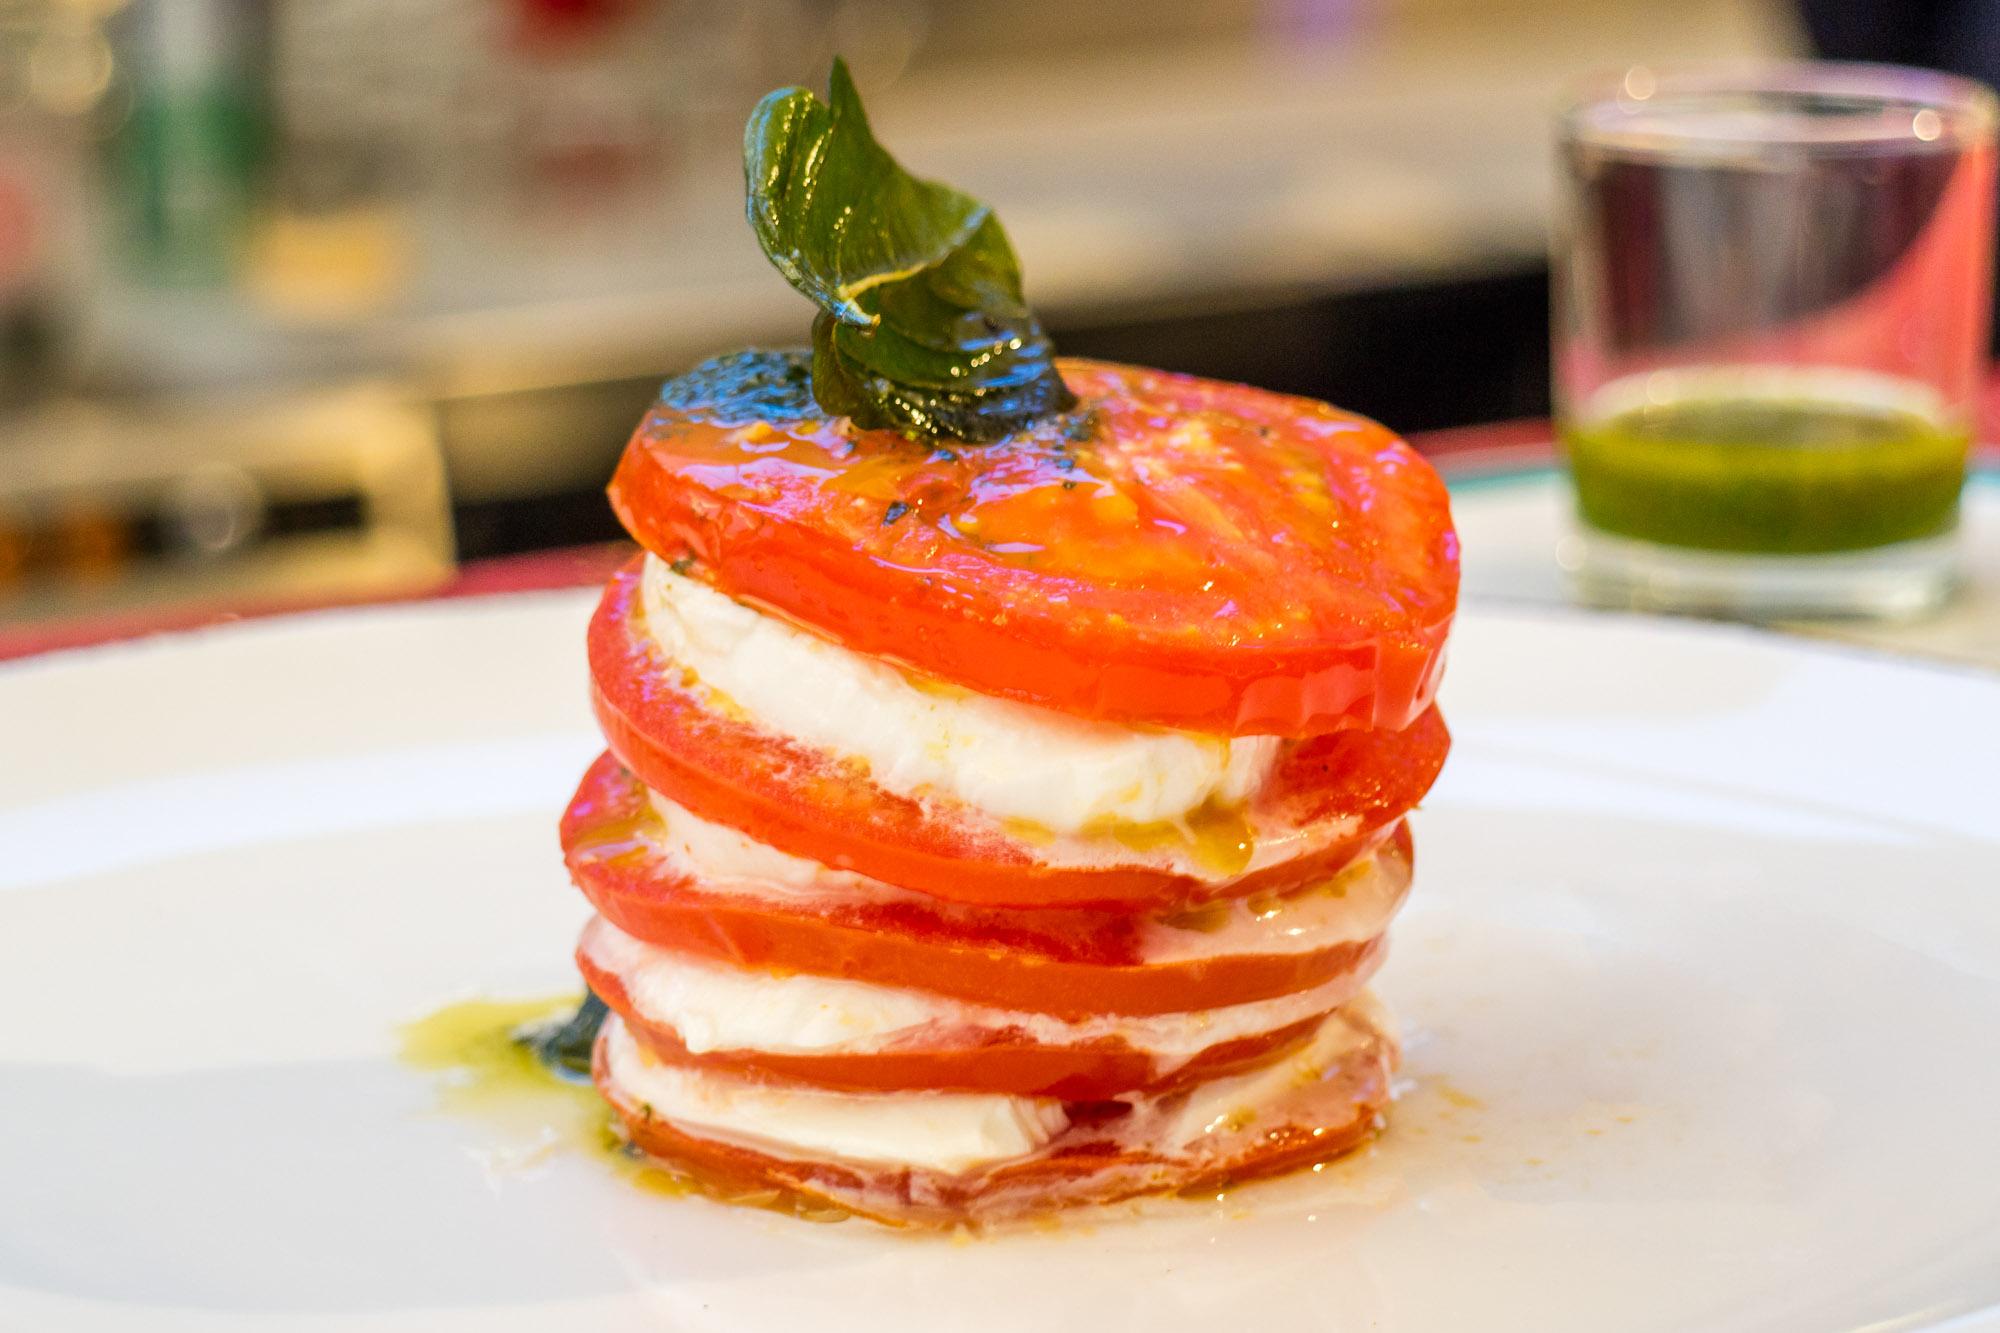 Caprese Salad Calderazzo on 31  Calderazzo on 31 ร้านอาหารอิตาเลี่ยนแท้ ย่านสุขุมวิท ที่แนะนำให้มาลอง p79o2y4hrETxURxaP6n o